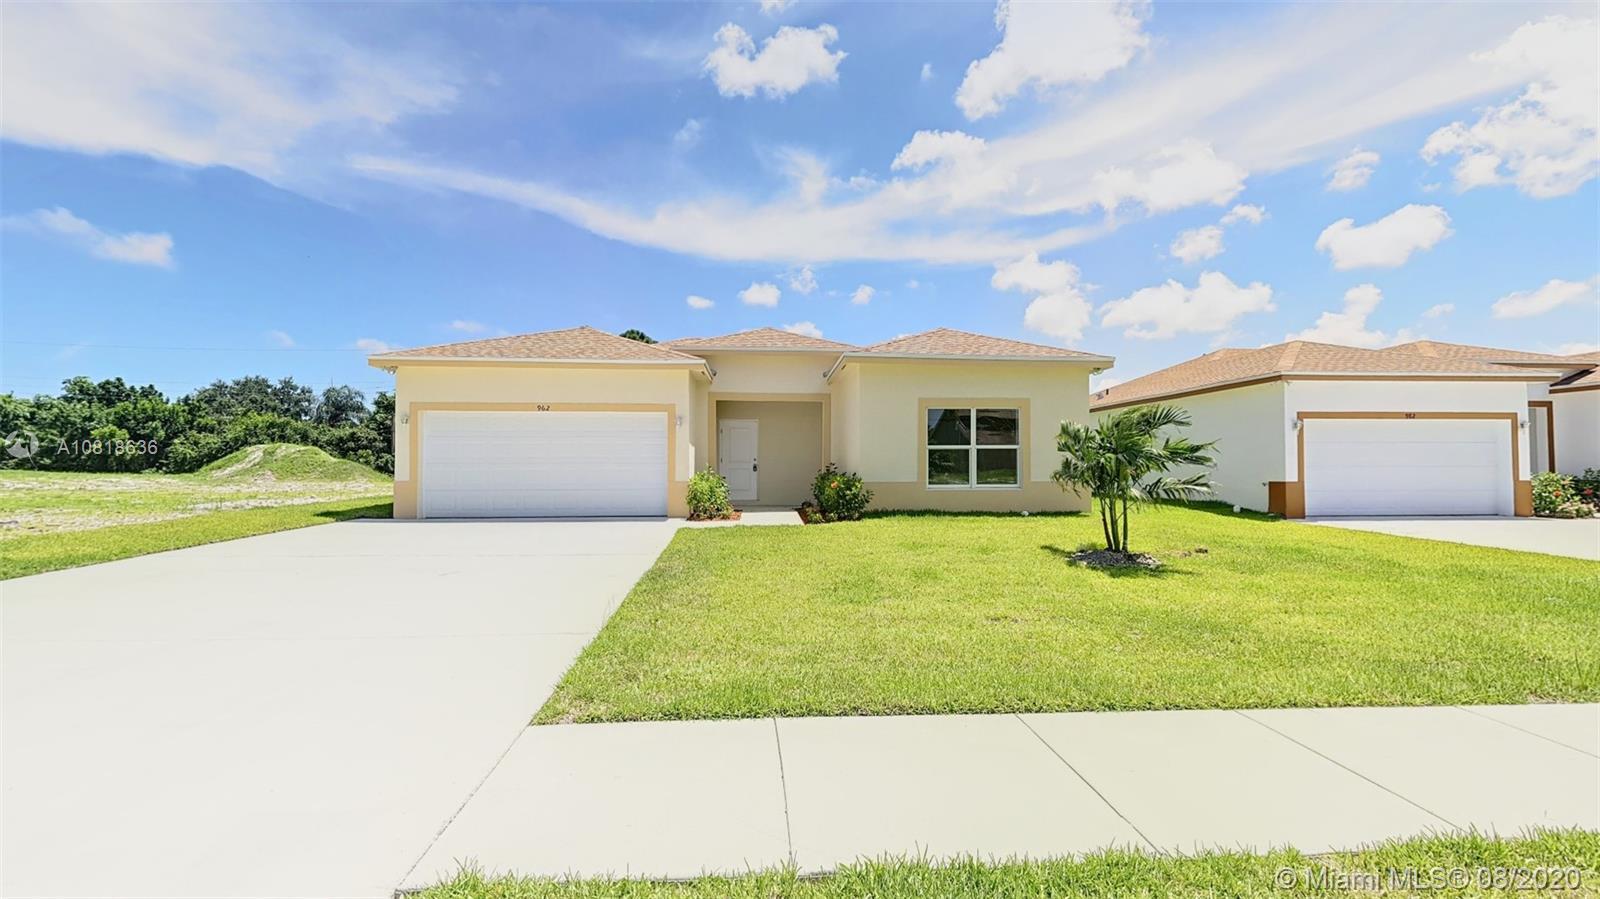 962 NW 9th Ave Property Photo - Boynton Beach, FL real estate listing